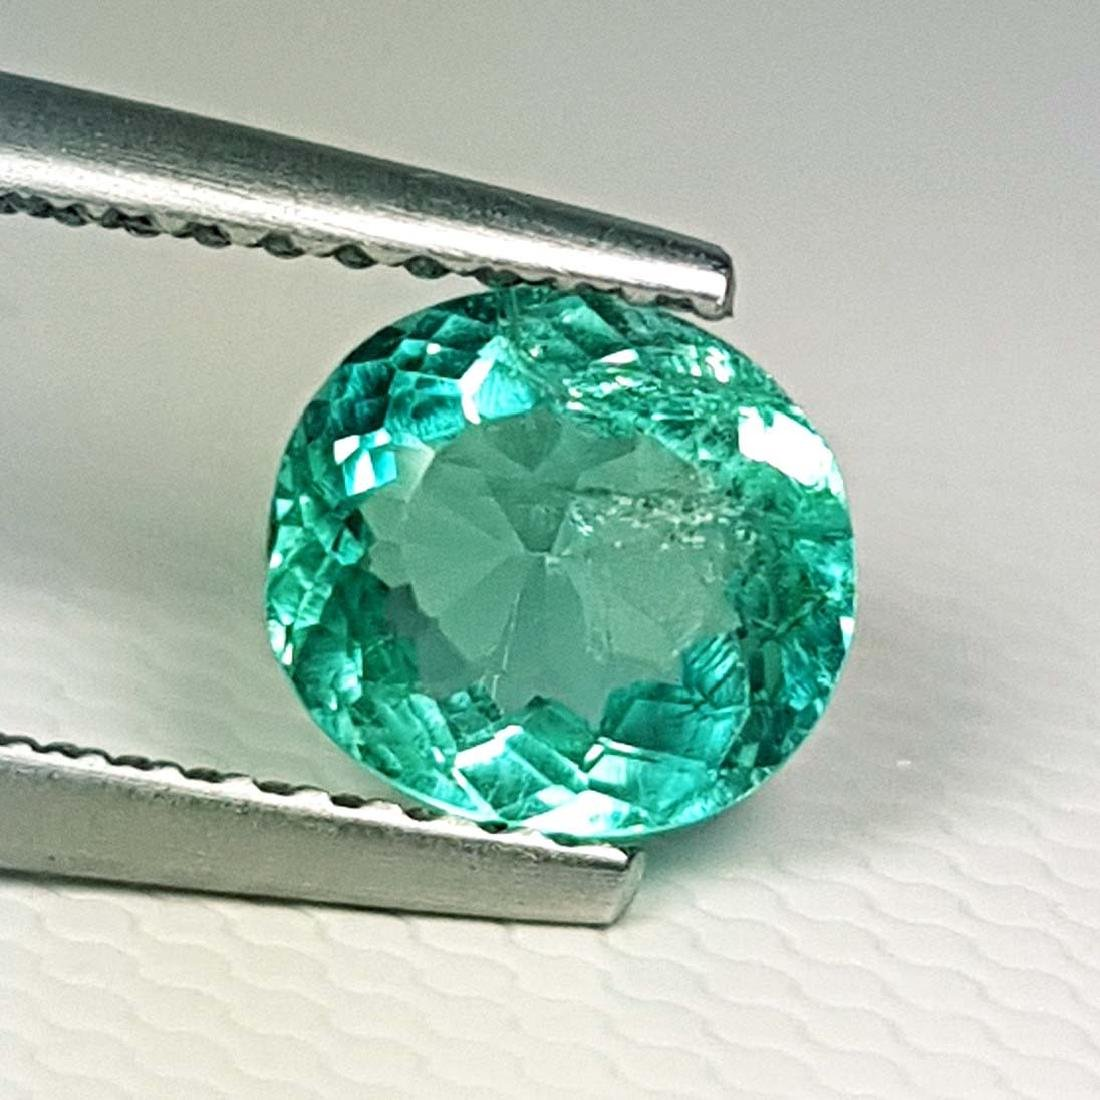 Natural Bluish Green Apatite - 1.16 ct